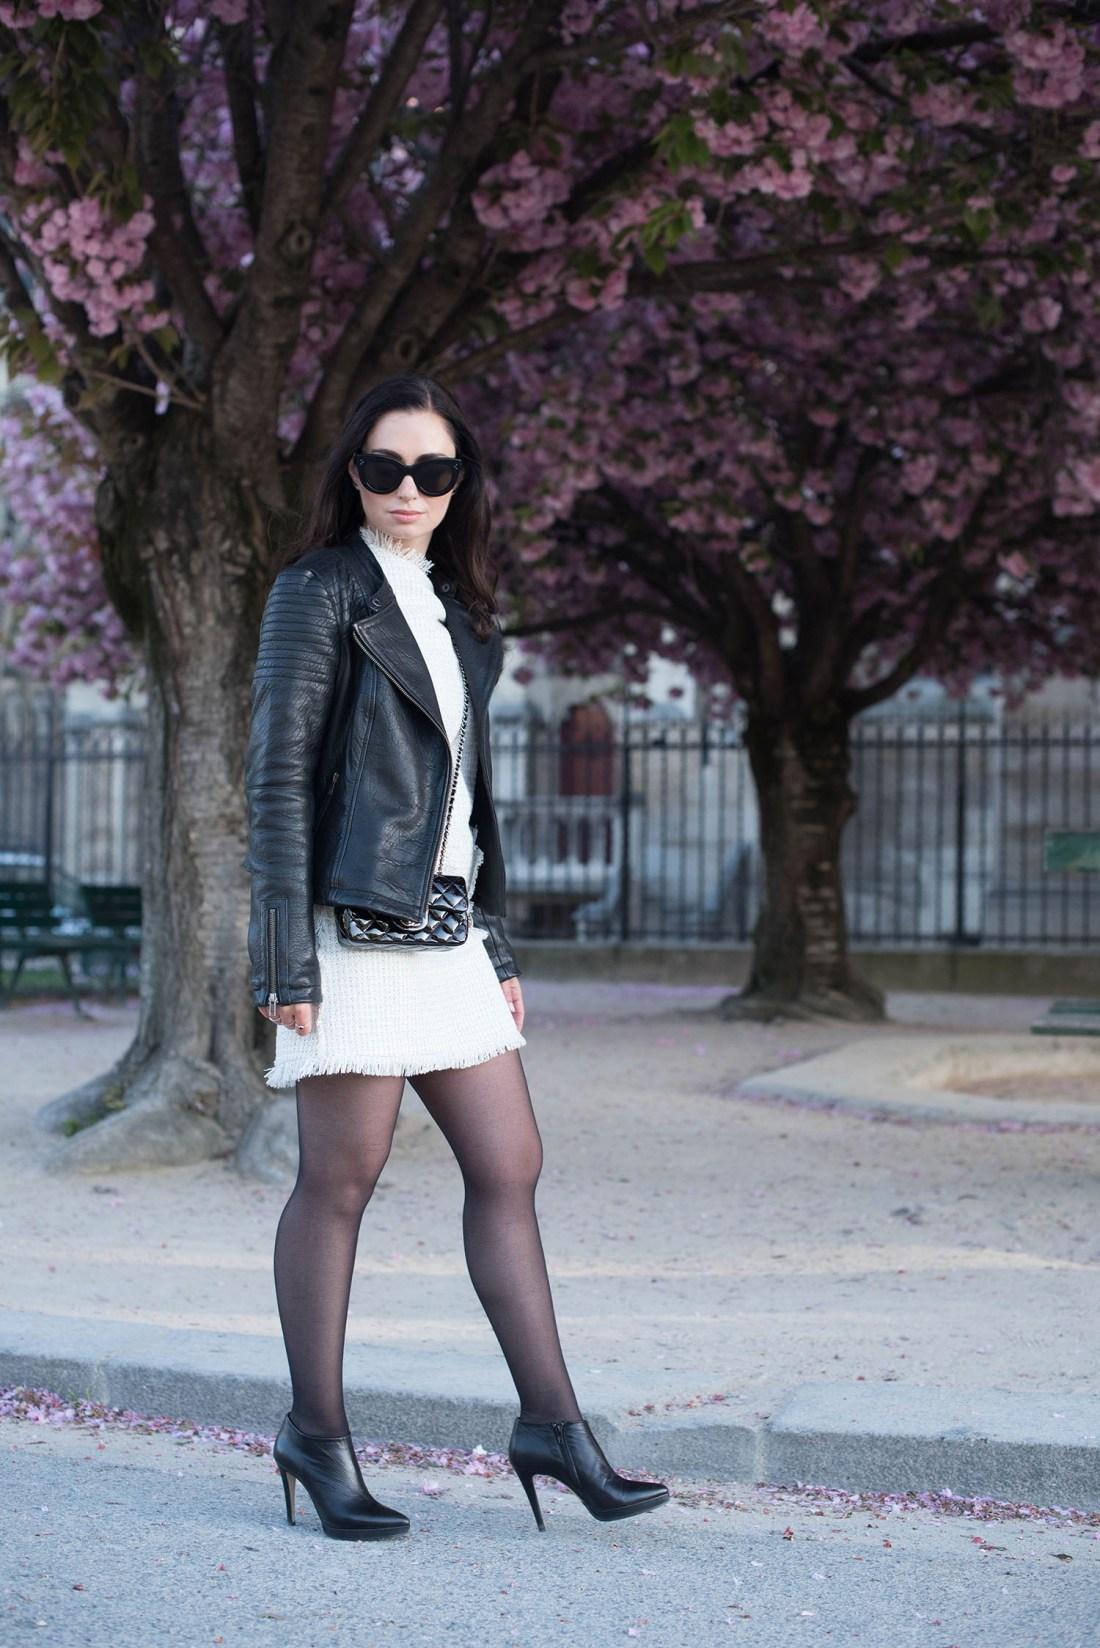 Fashion blogger Cee Fardoe of Coco & Vera walks on Ile de la Cite wearing a Floriane Fosso dress and Le Chateau boots